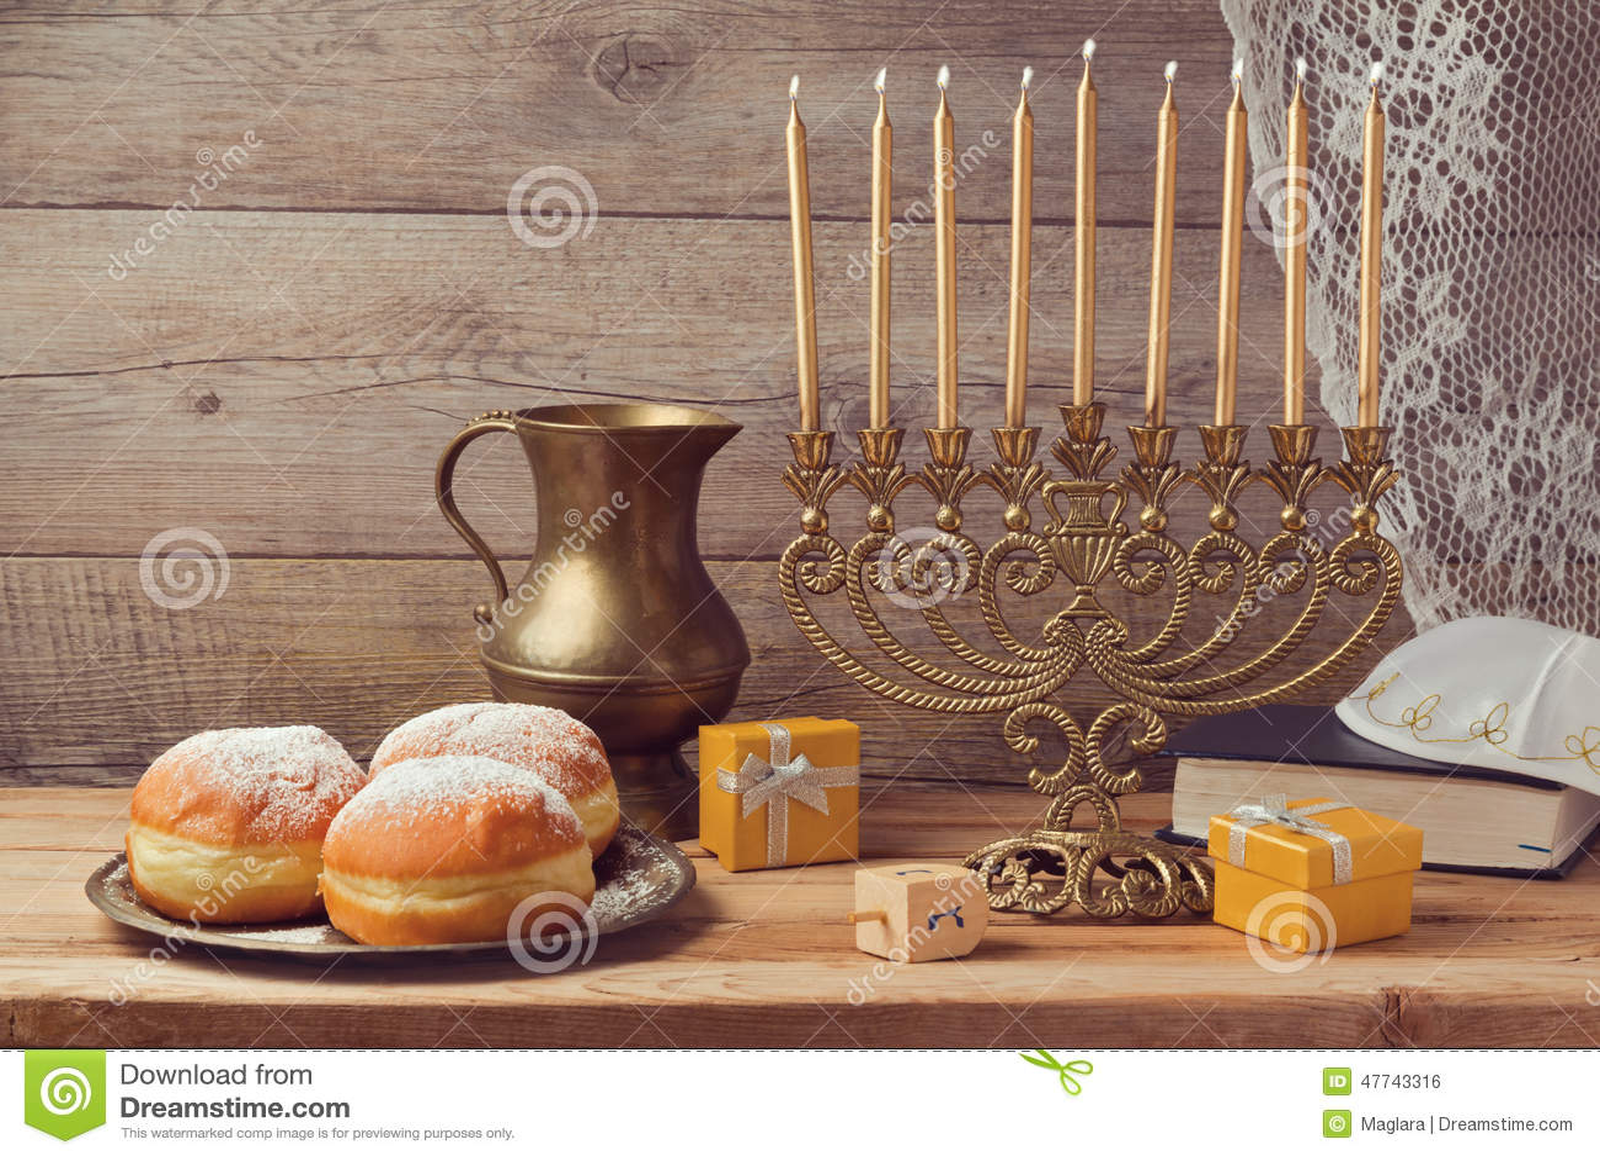 Jewish holiday Hanukkah celebration with vintage menorah